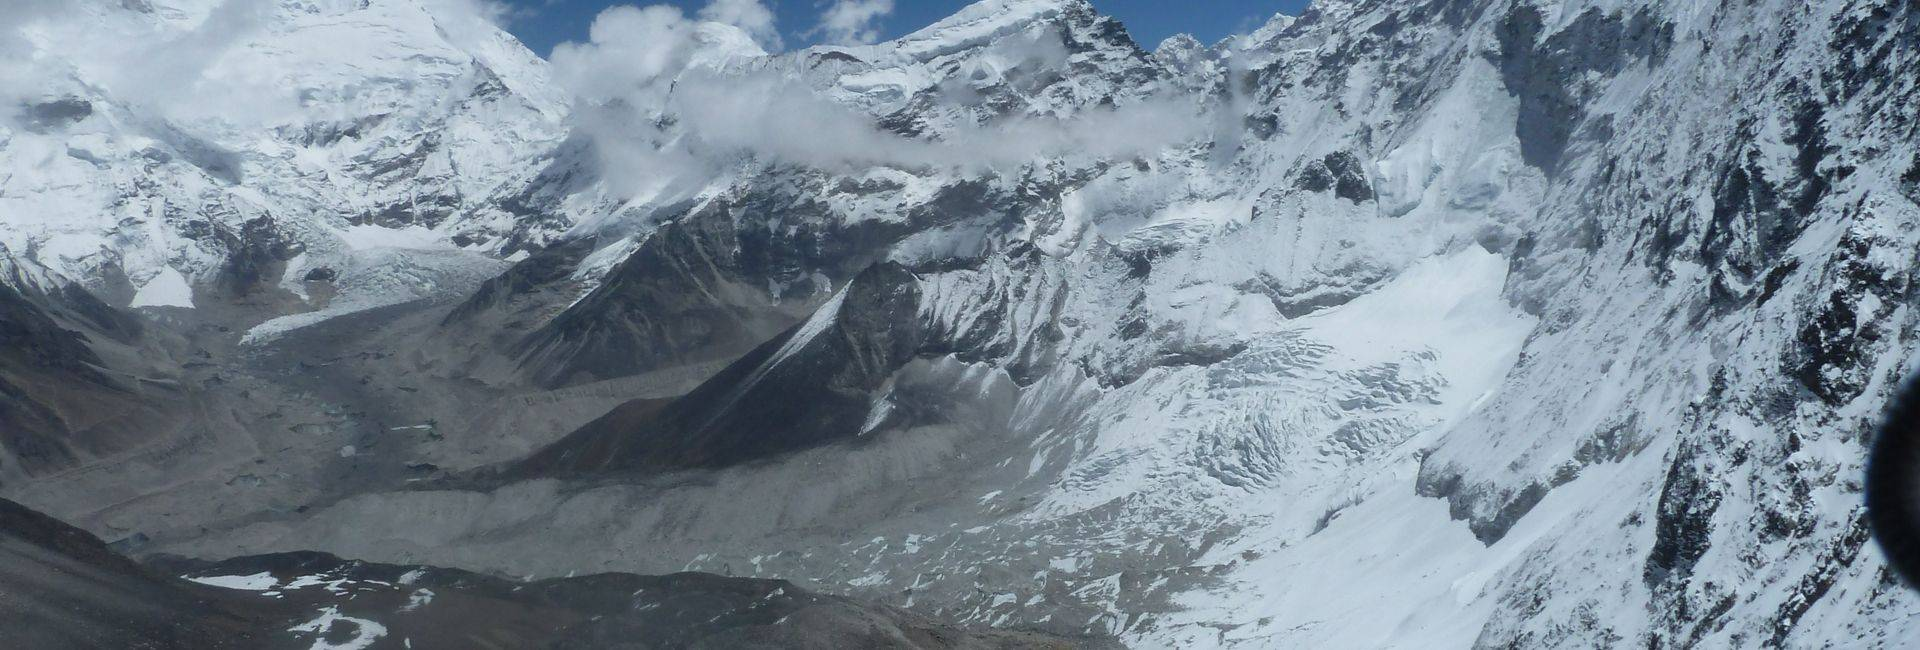 Makalu to Everest GHT in Nepal